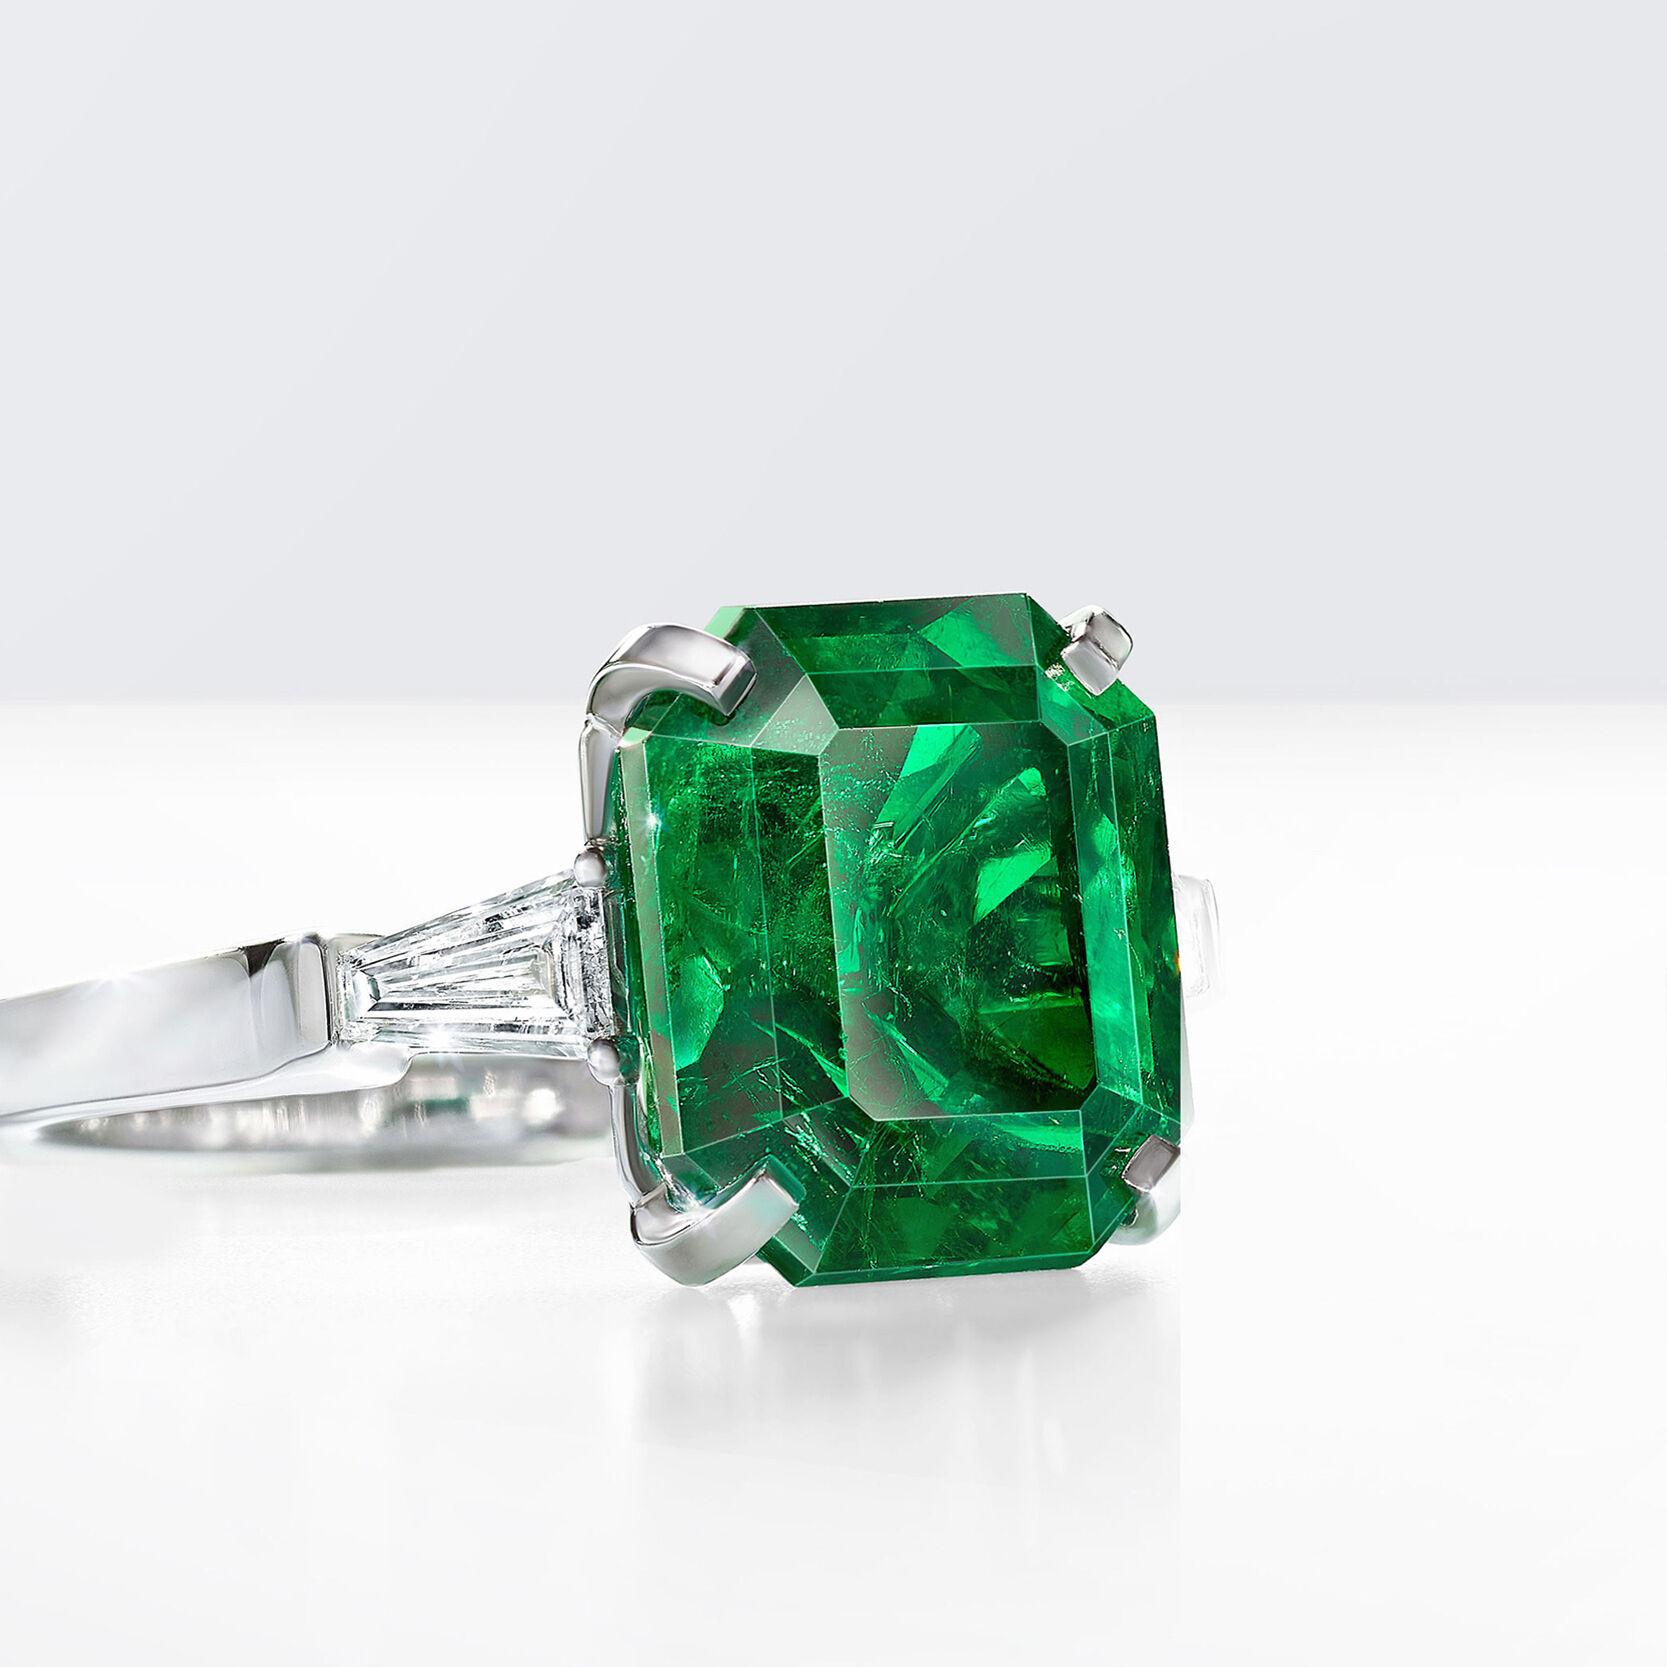 An emerald cut emerald ring with baguette cut side diamonds by Graff